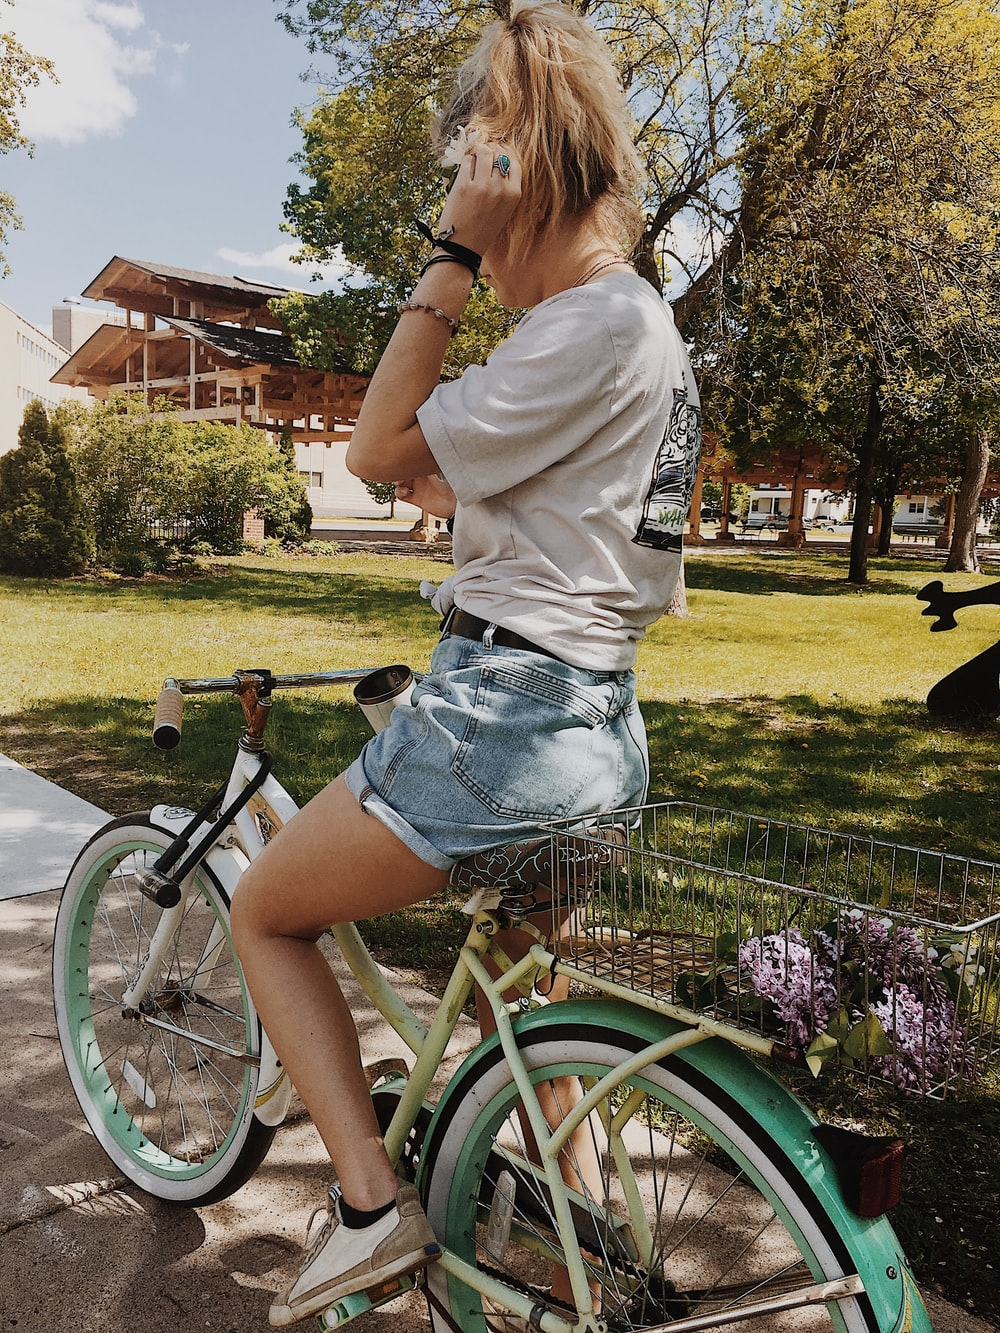 man riding white and green cruiser bike